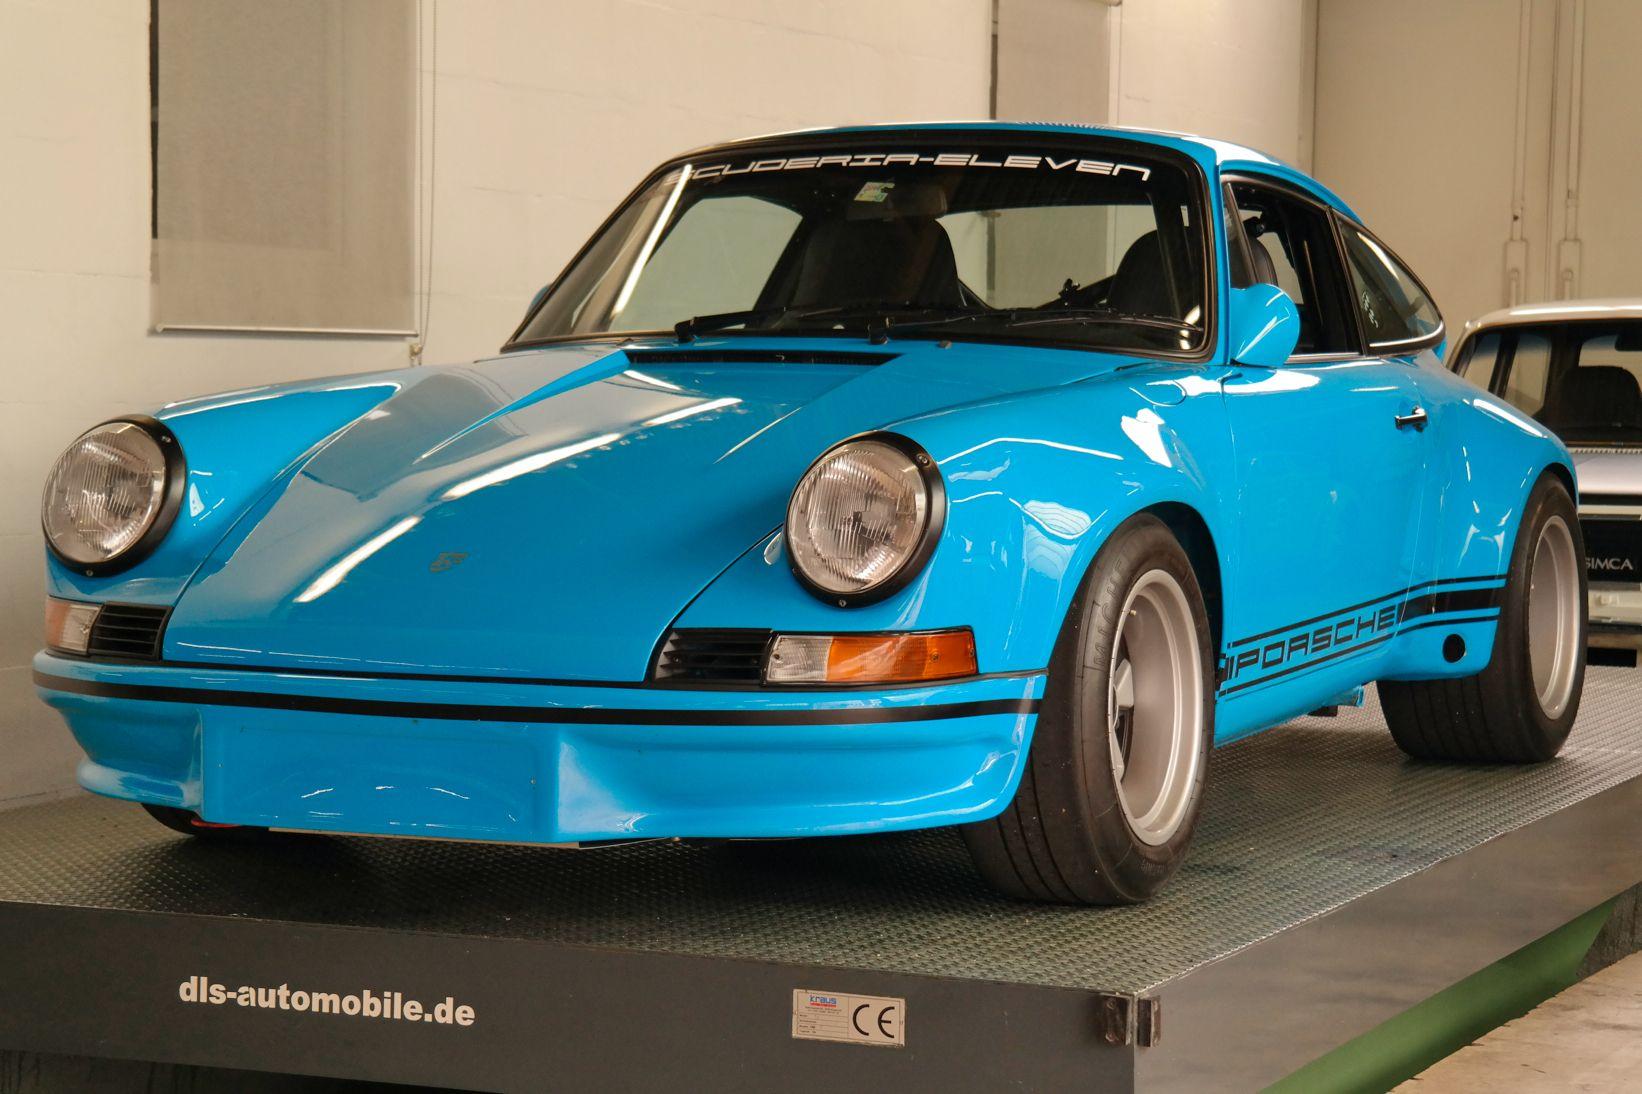 Porsche 911 28 rsr tribute sport cars pinterest porsche 911 porsche 911 28 rsr tribute vanachro Images